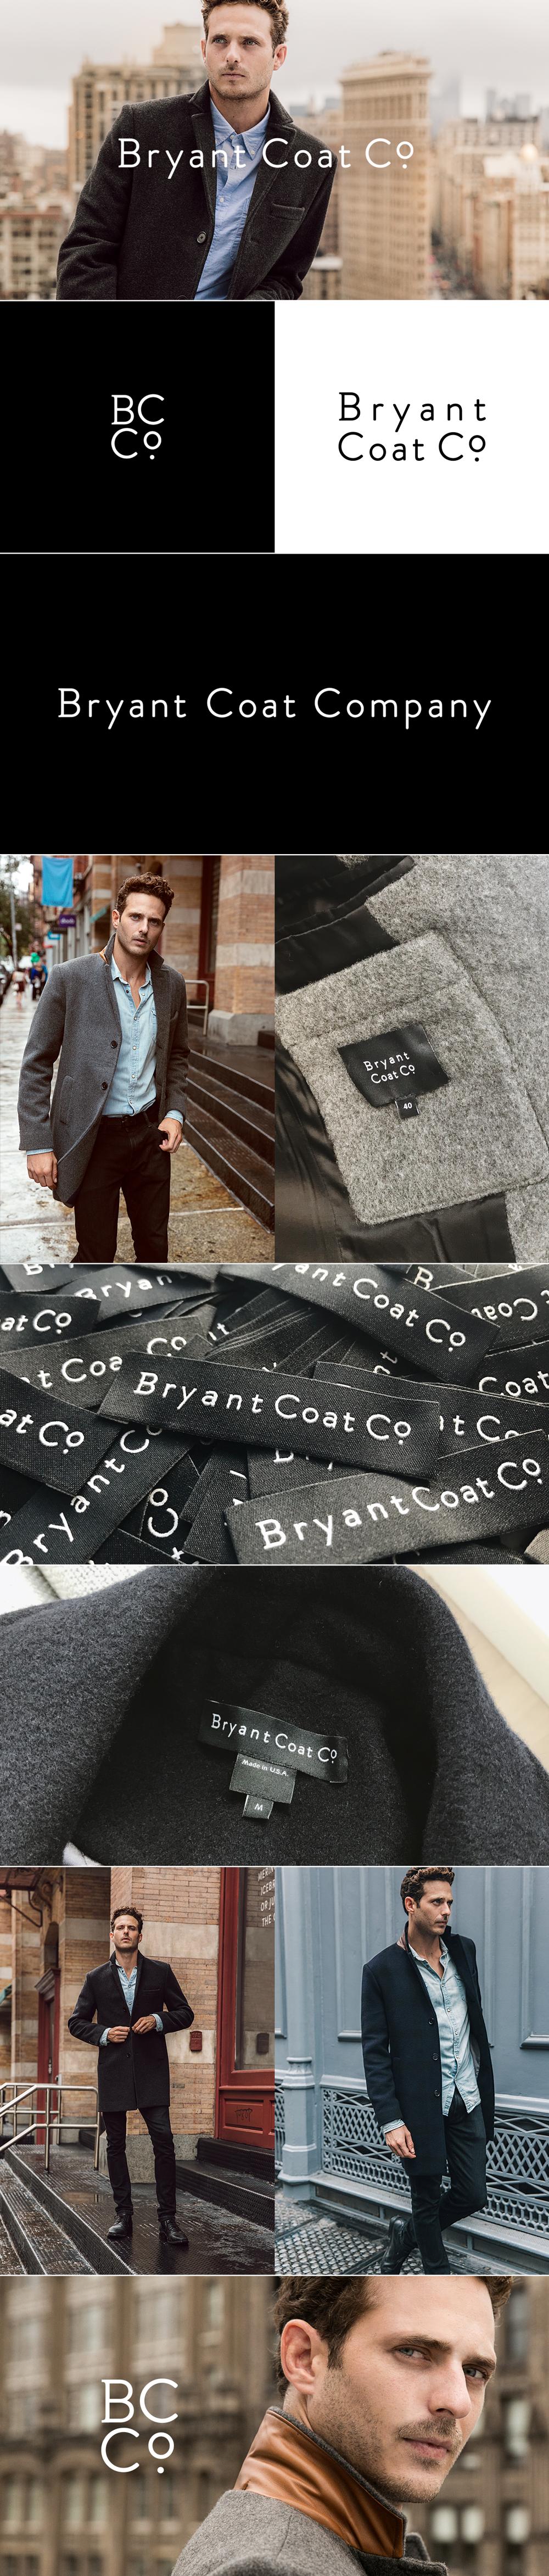 BryantCoatCo_Brand.png